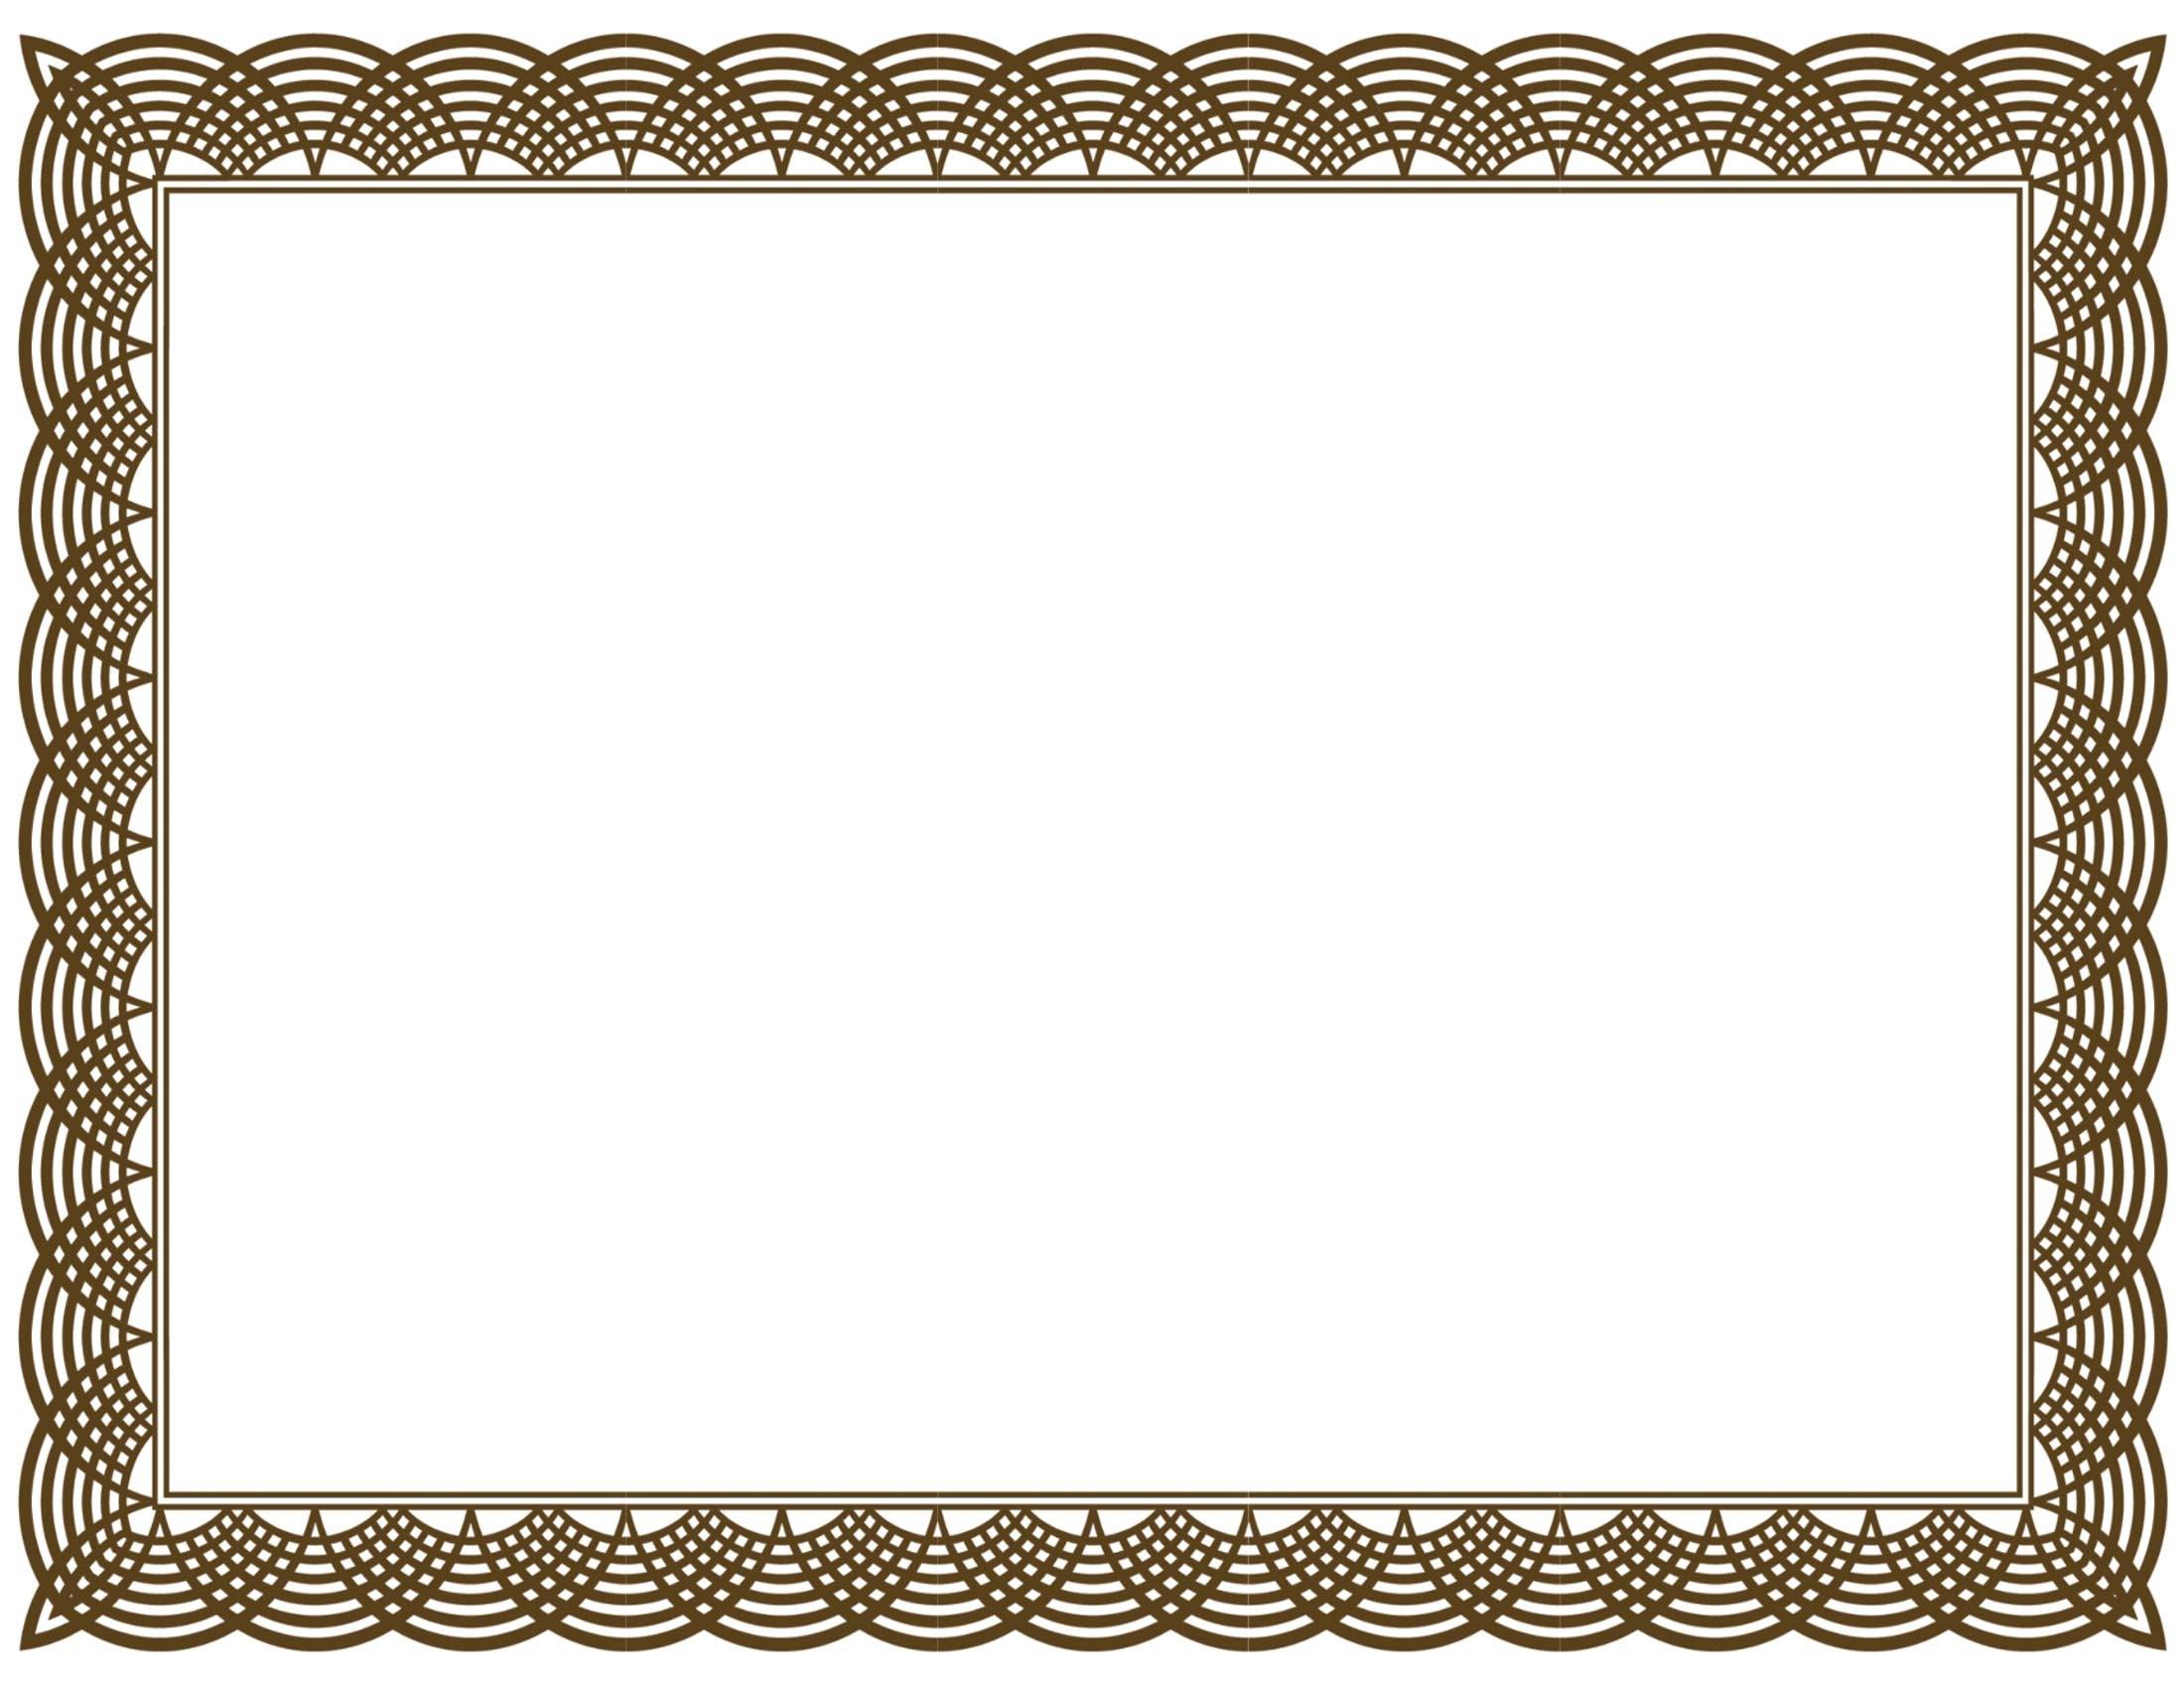 Award clipart certificate. Border incep imagine ex